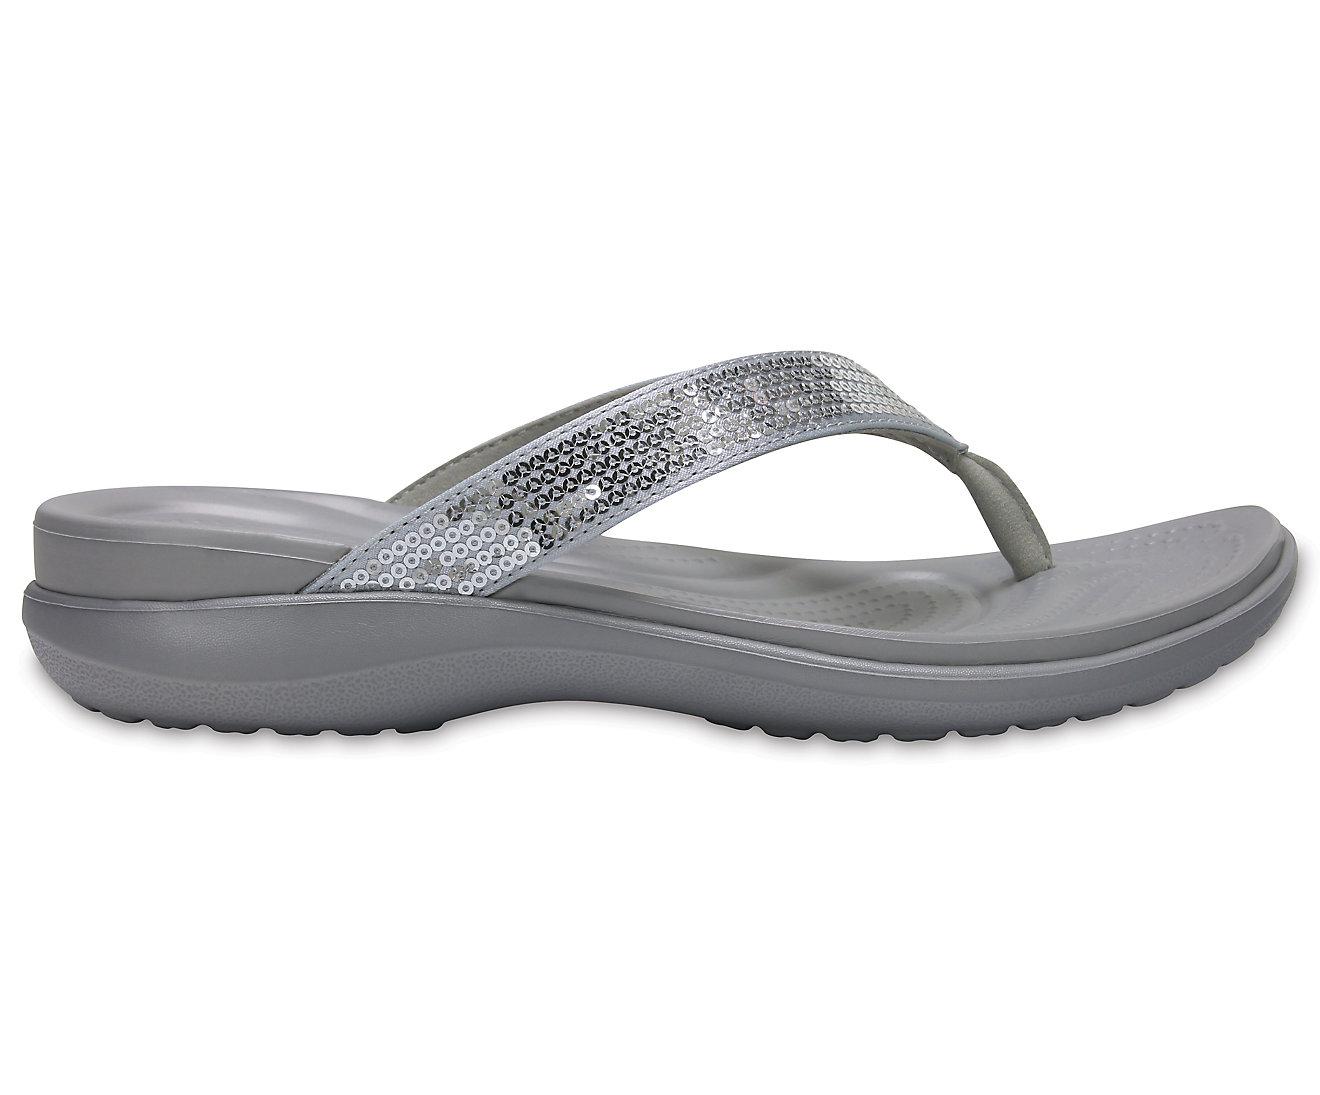 717f1ed833 Details about NEW Genuine Crocs Women Capri V Sequin Silver